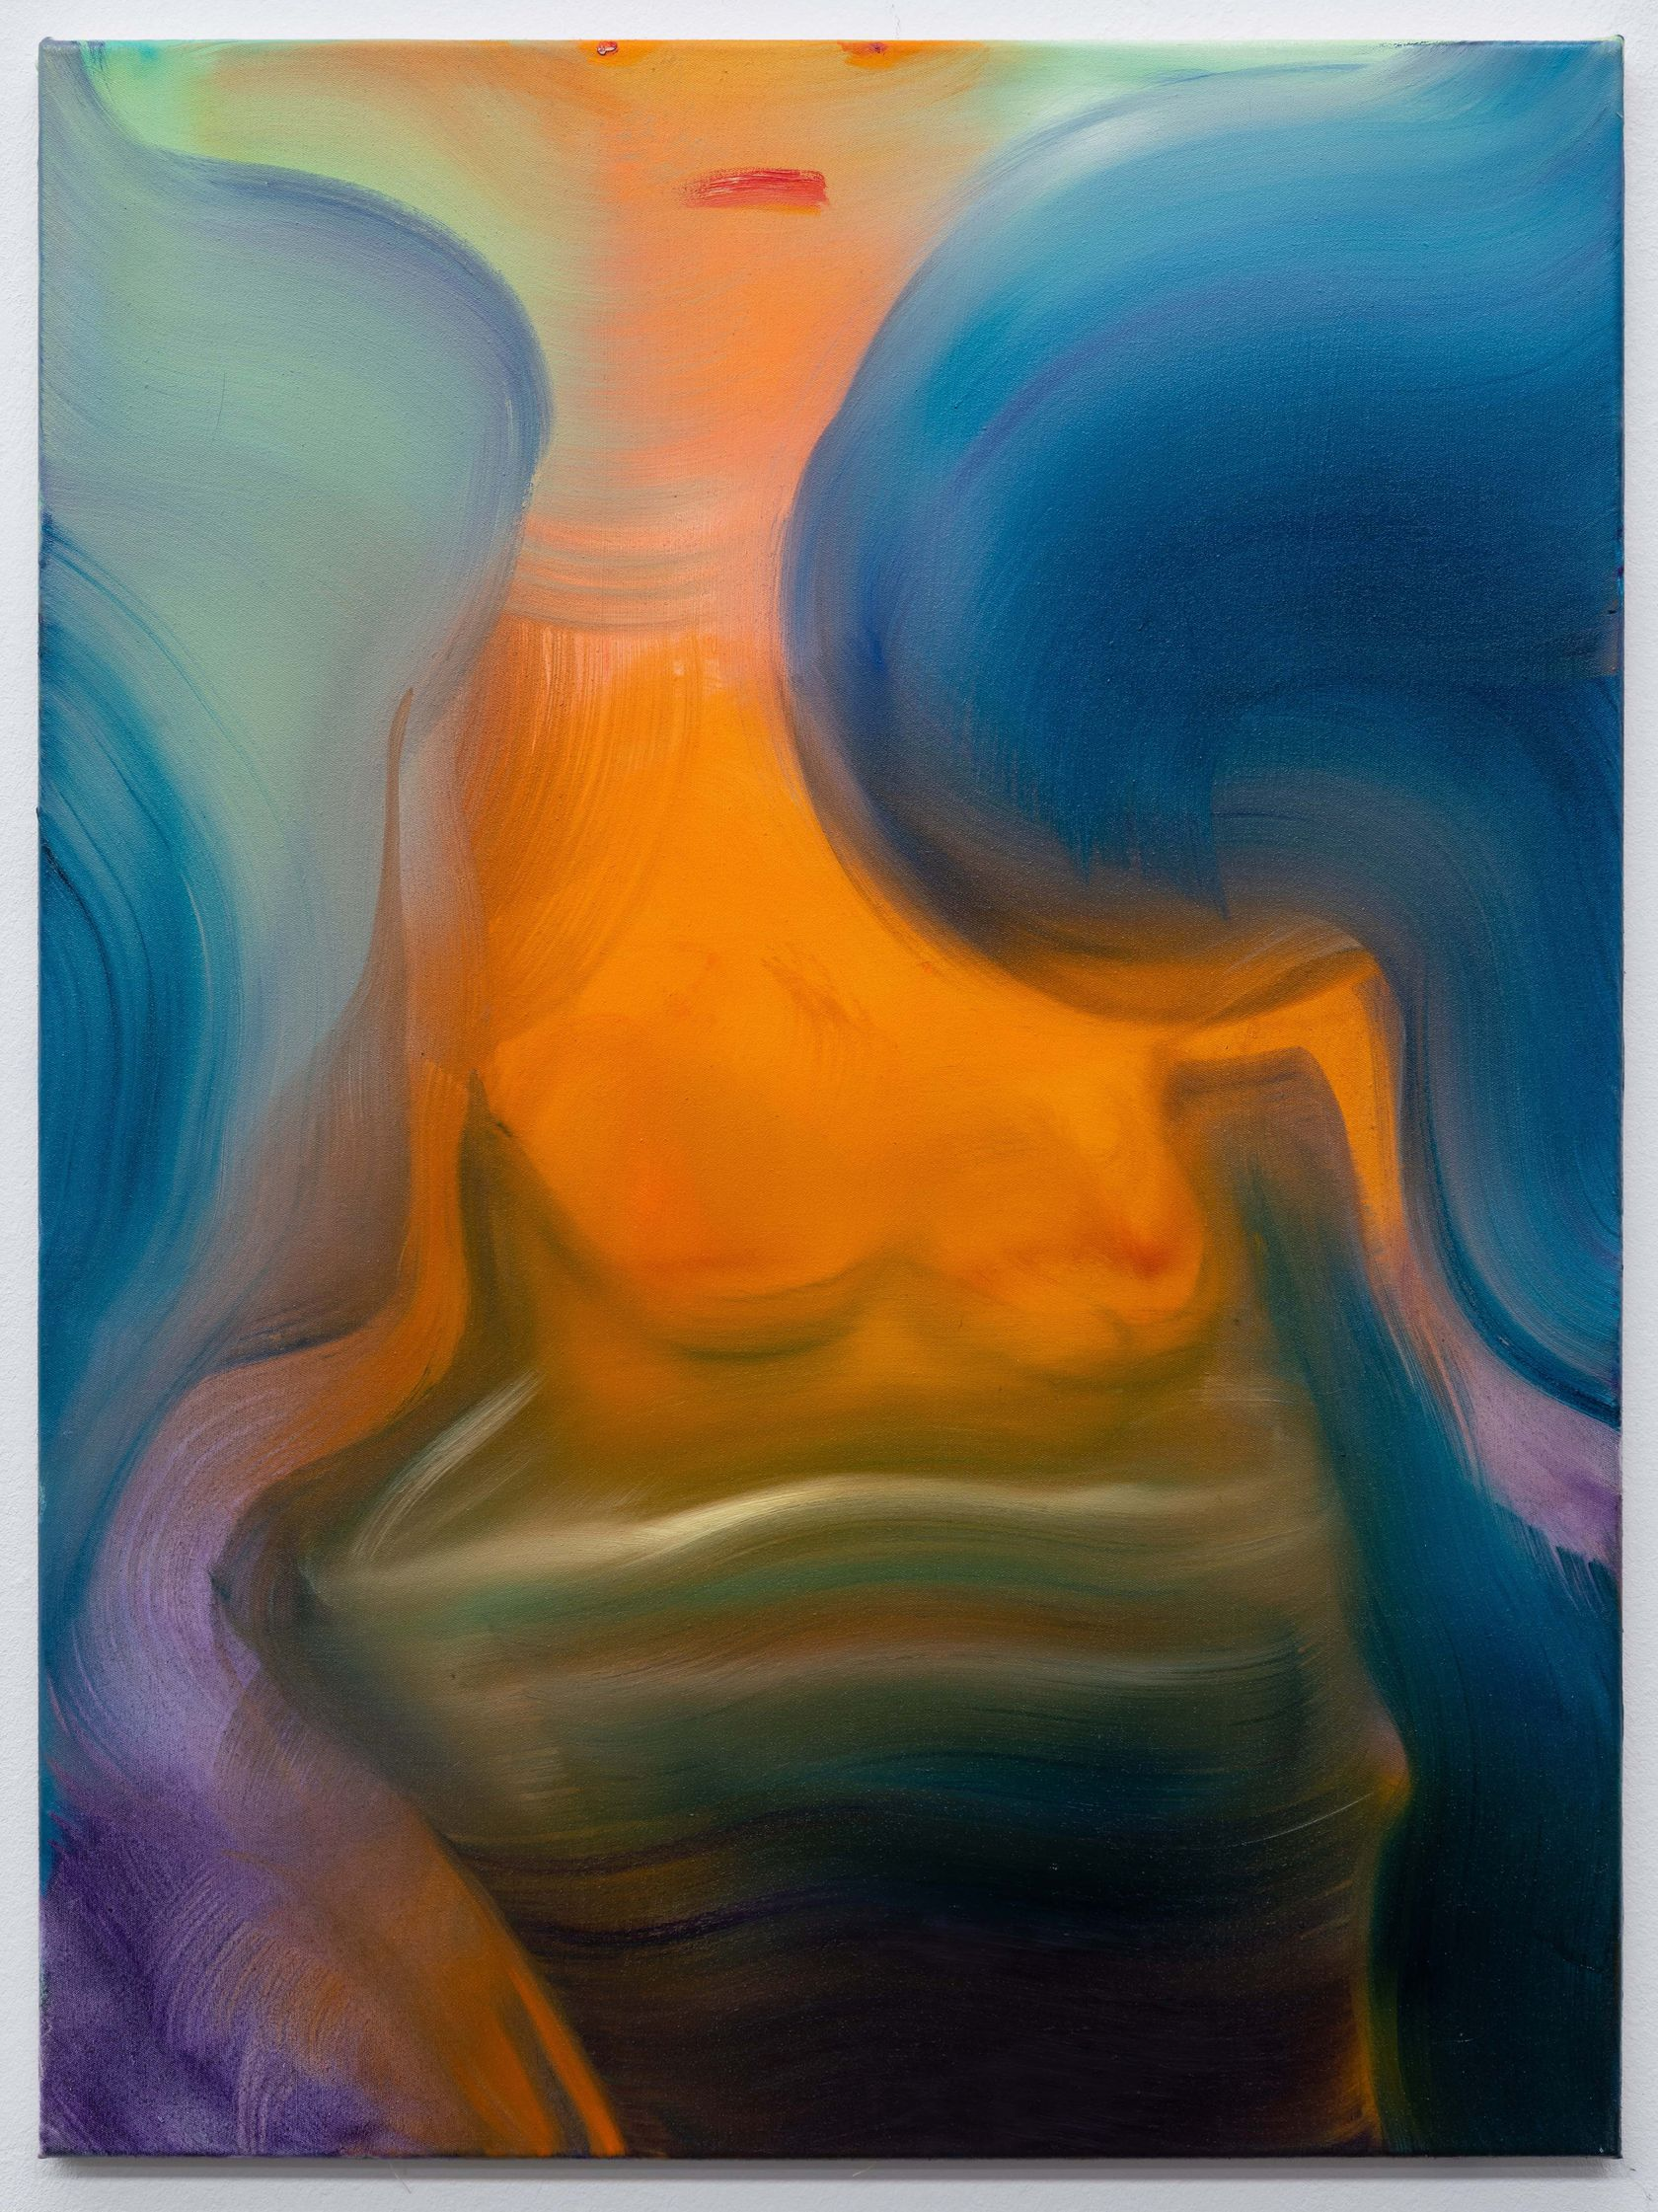 Aneta Kajzer, Alien Pool, 2021 Huile sur toile80 × 60 cm / 31 1/2 × 23 5/8 in.